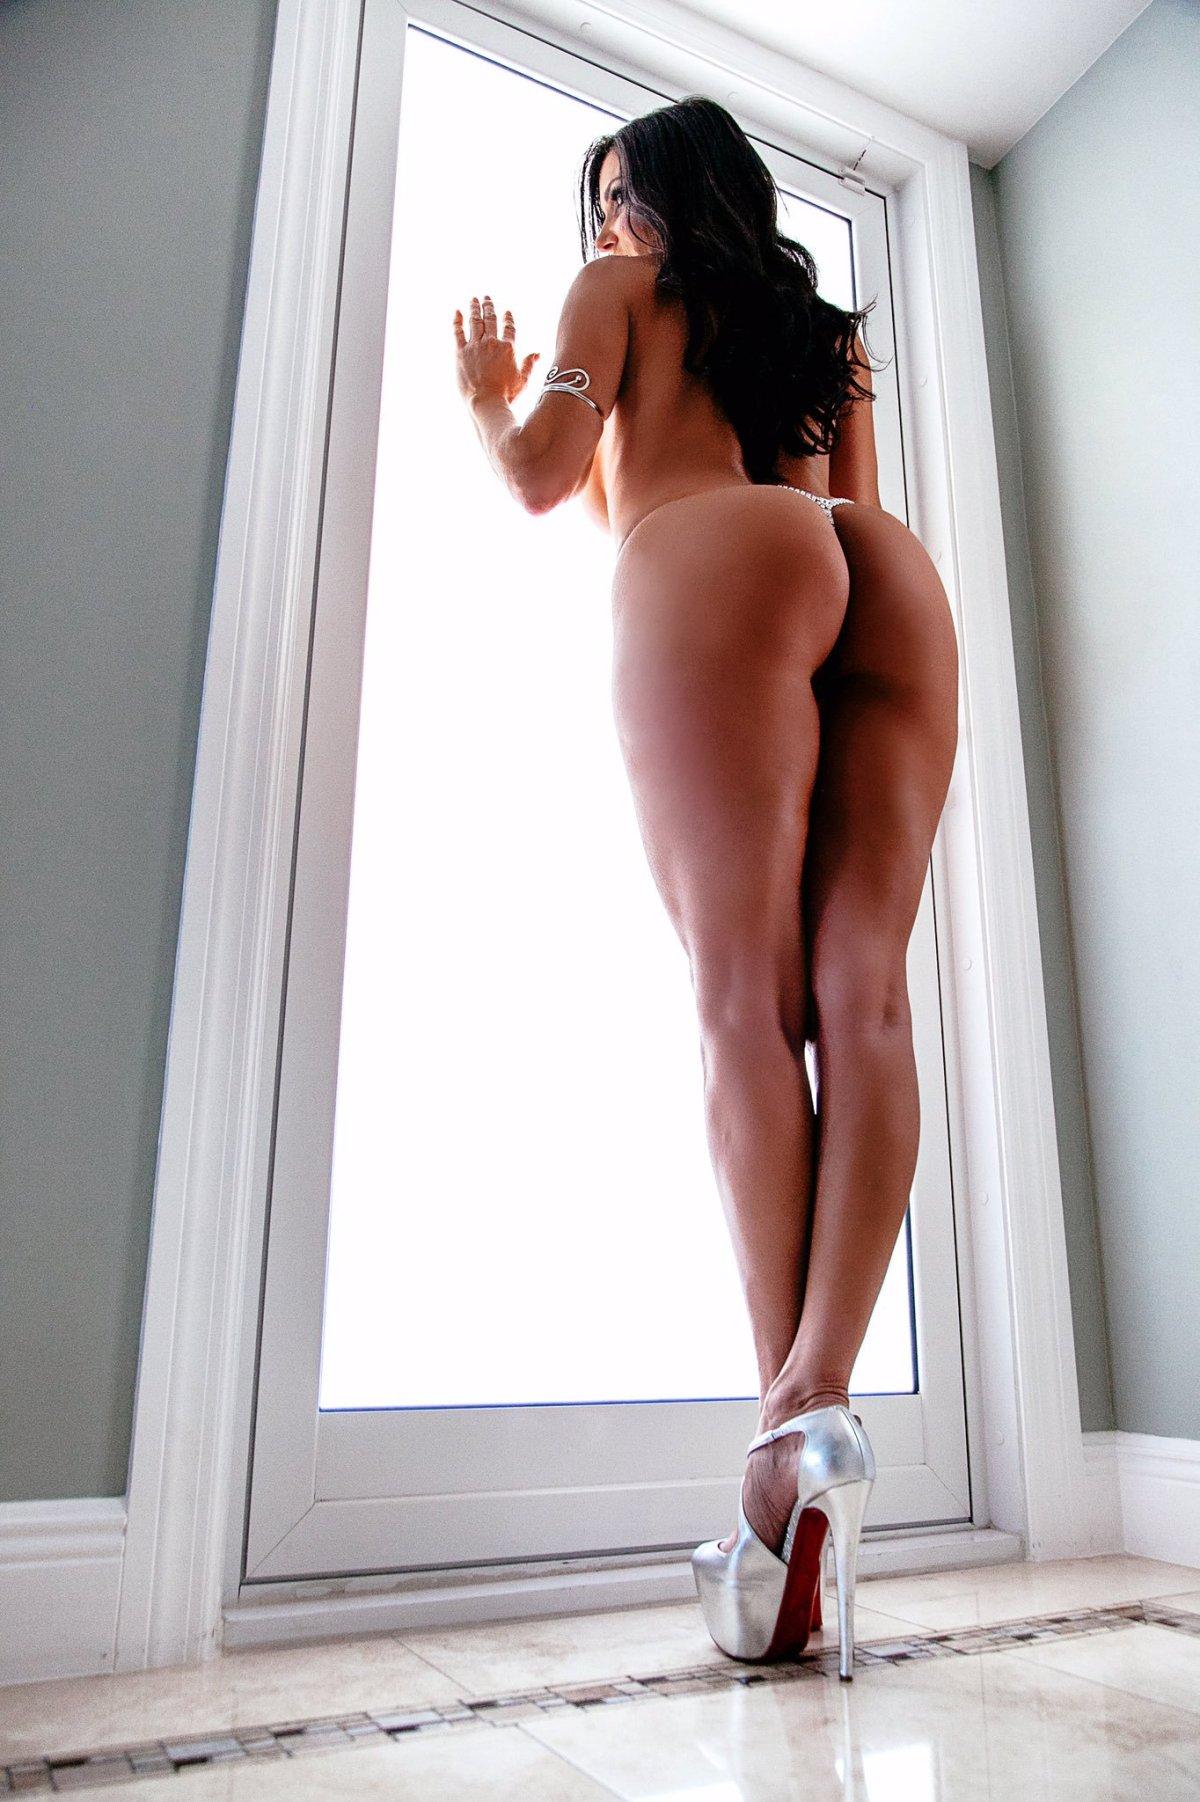 Butt3rflyforu